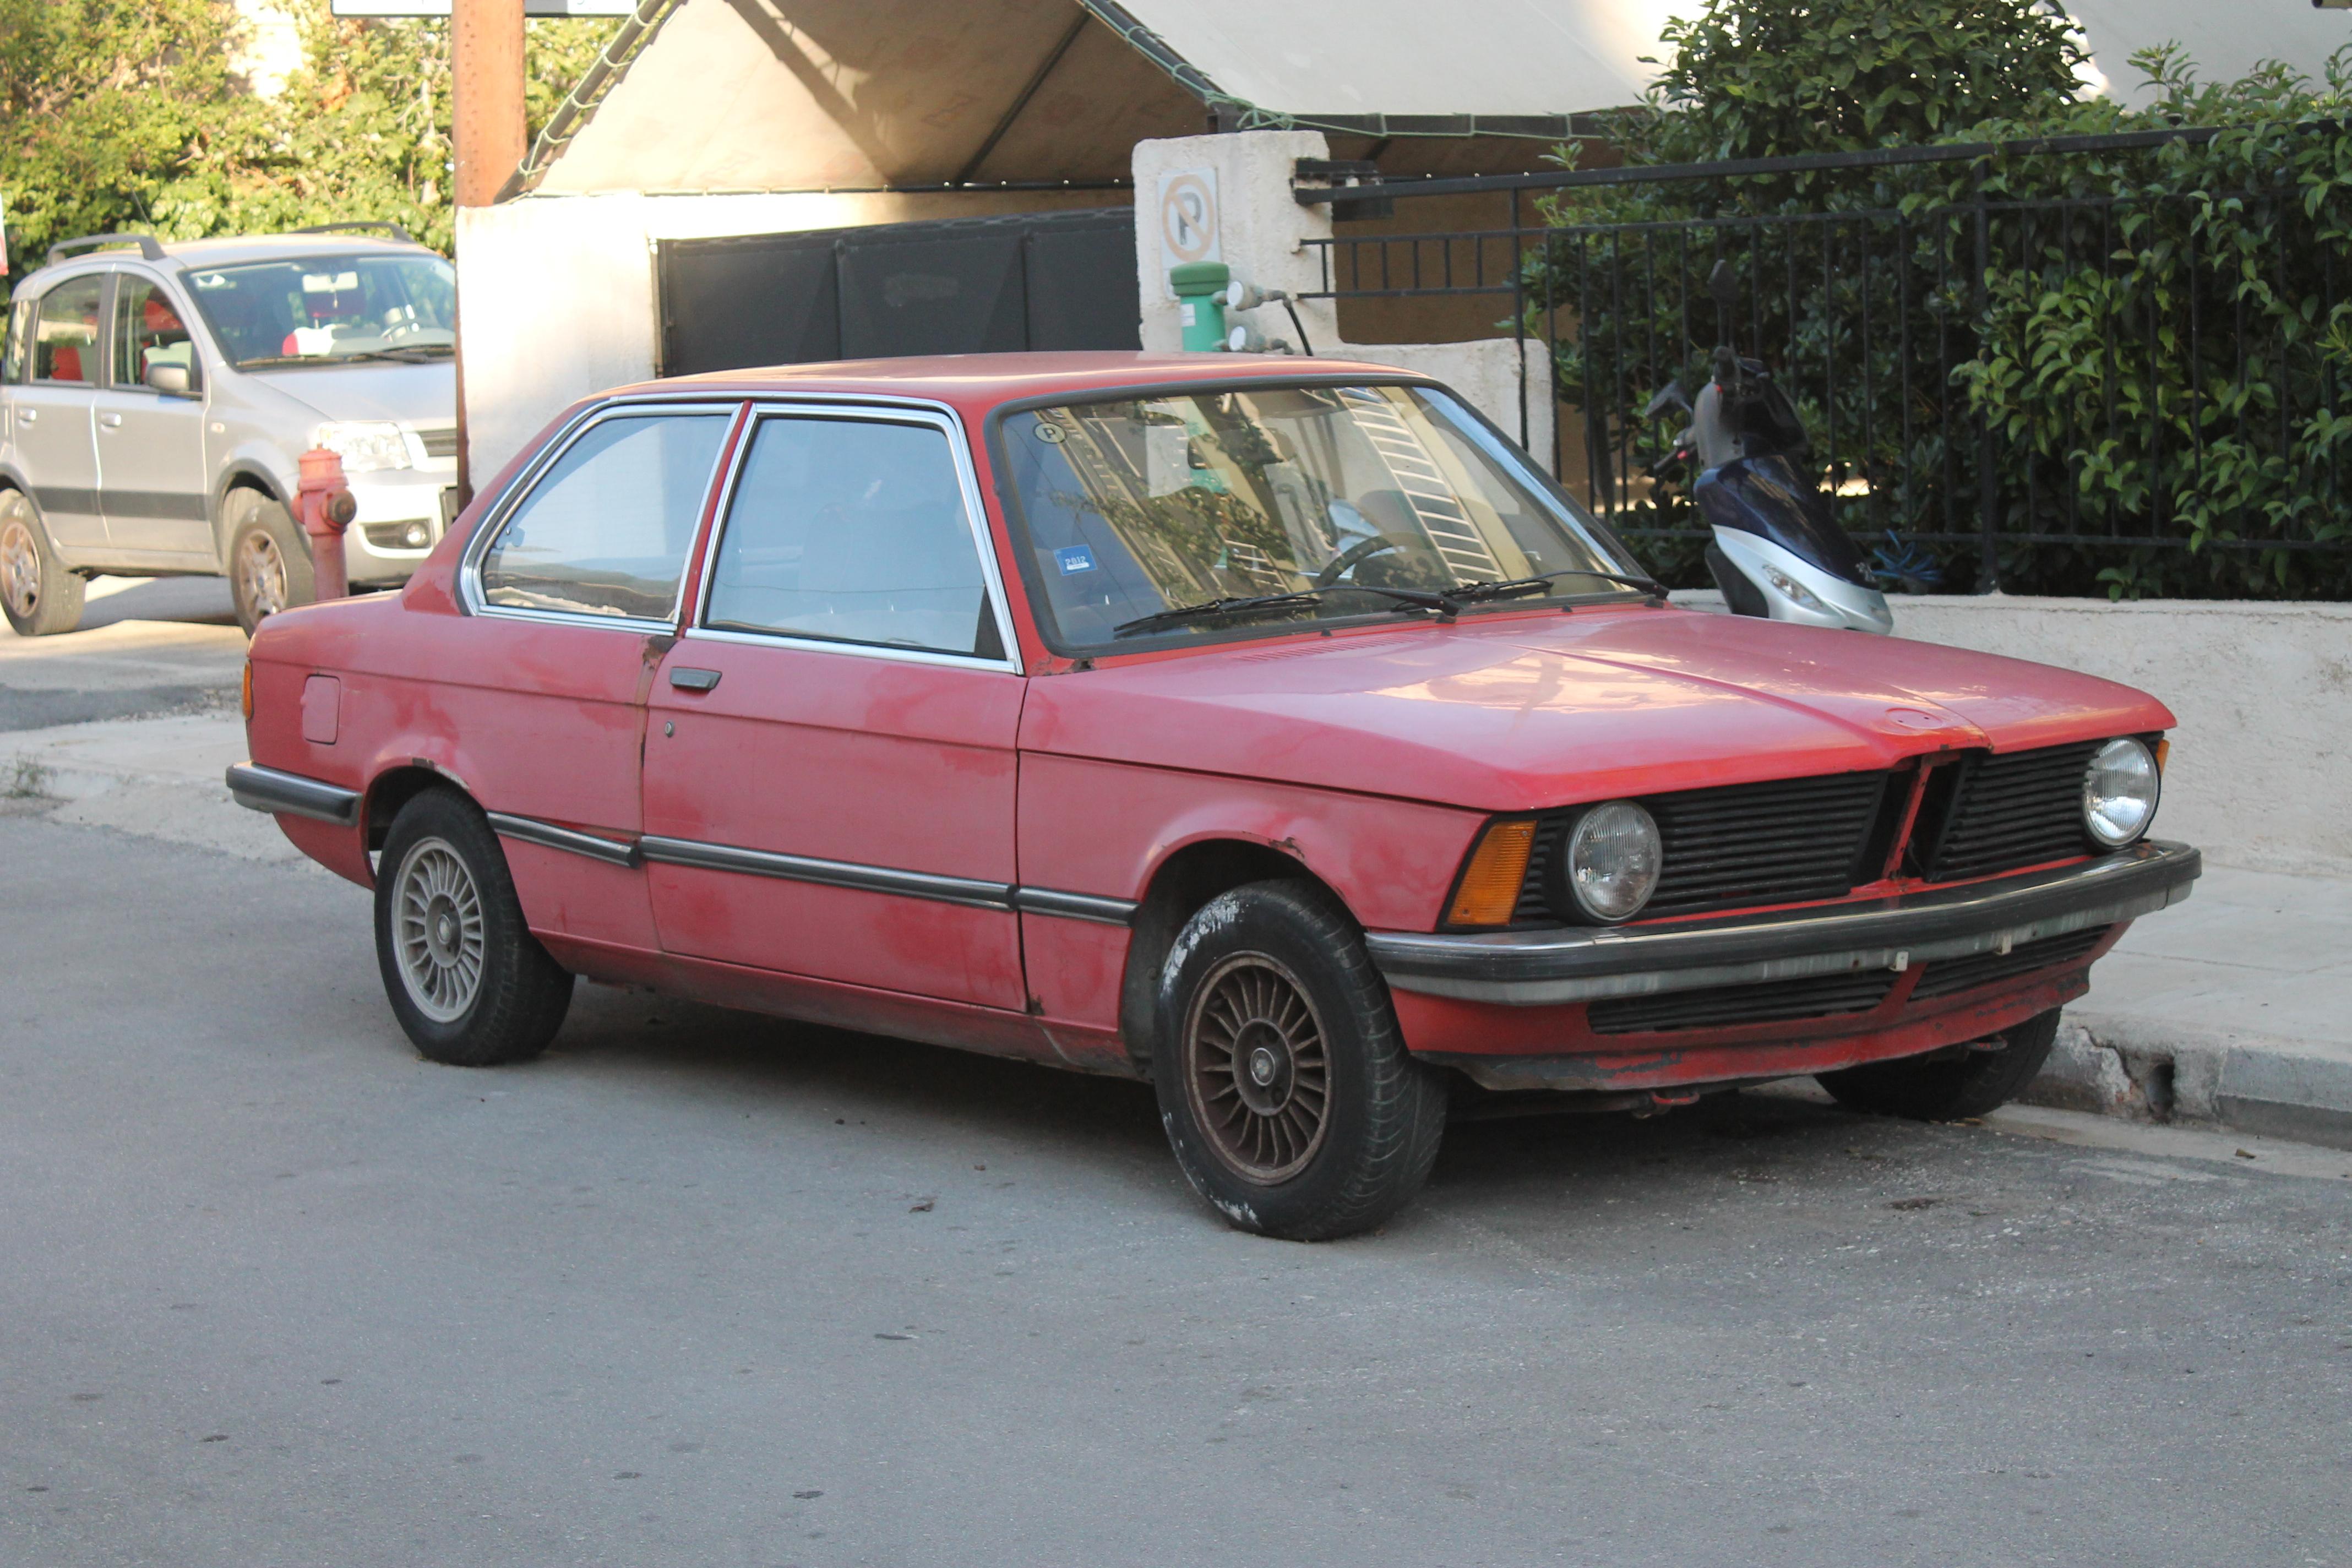 File:Abandoned BMW 318 E21 (1975-83) (10516860205).jpg